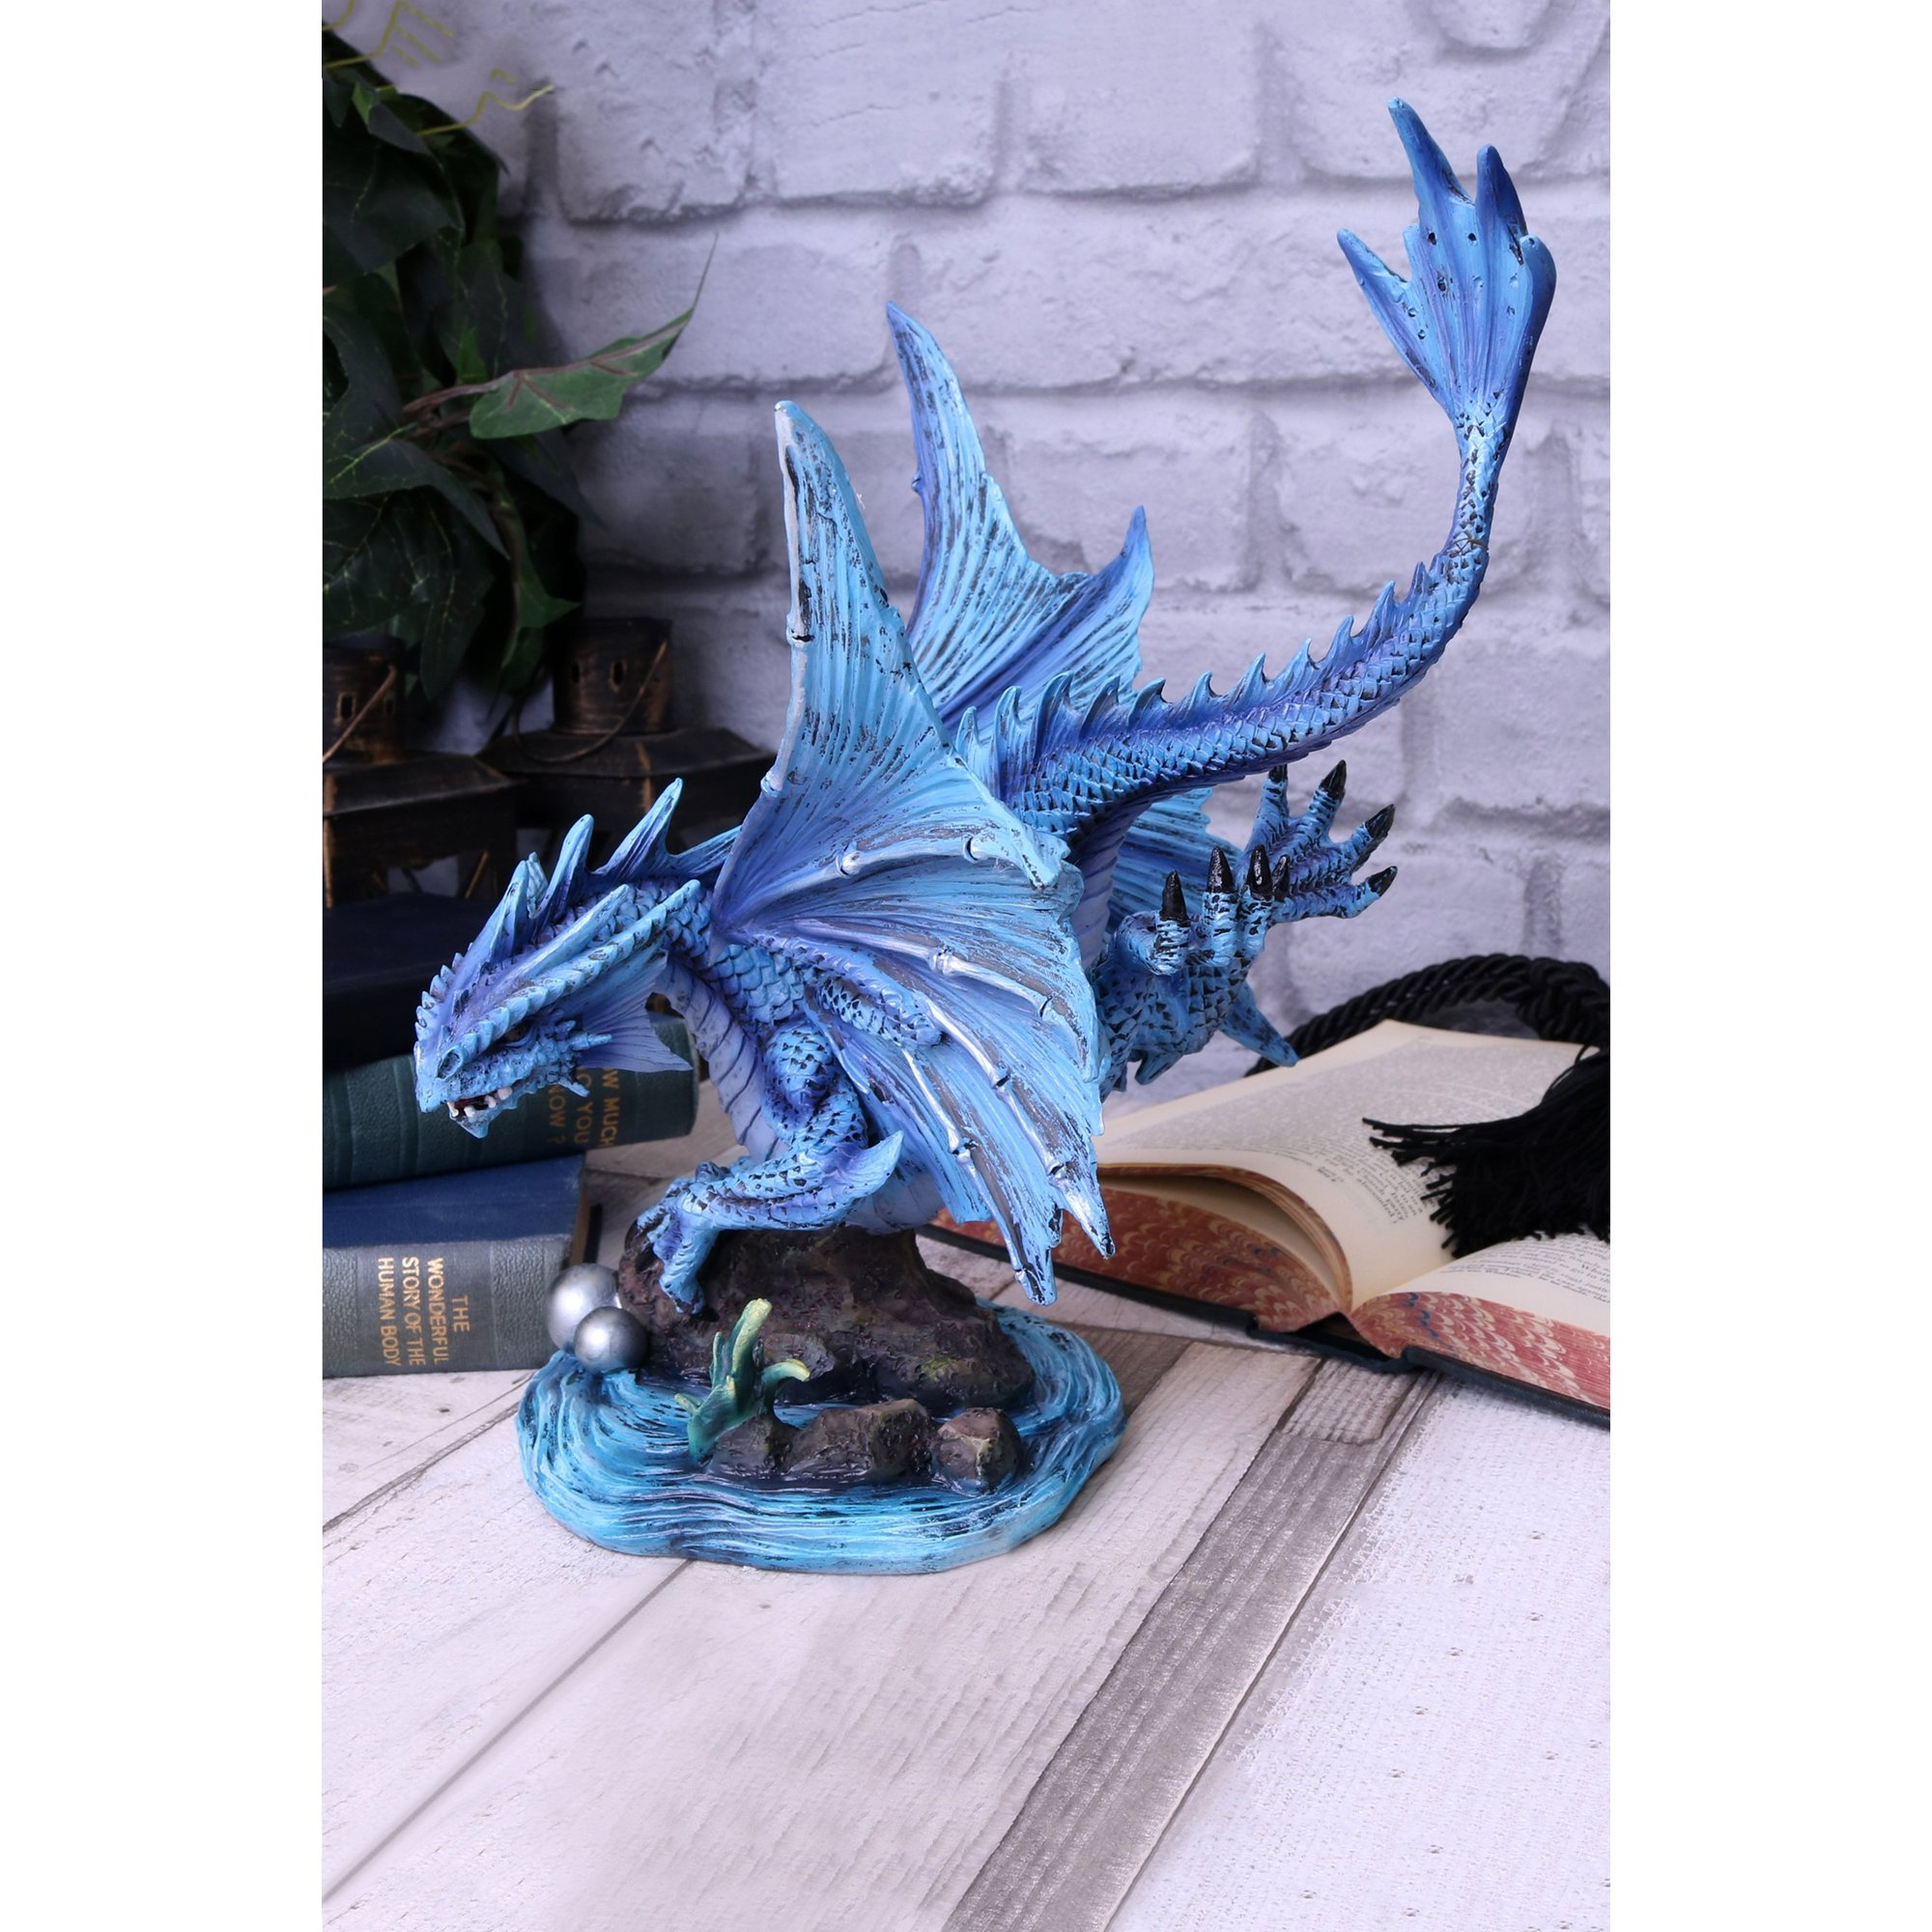 Image of Adult Water Dragon Figurine